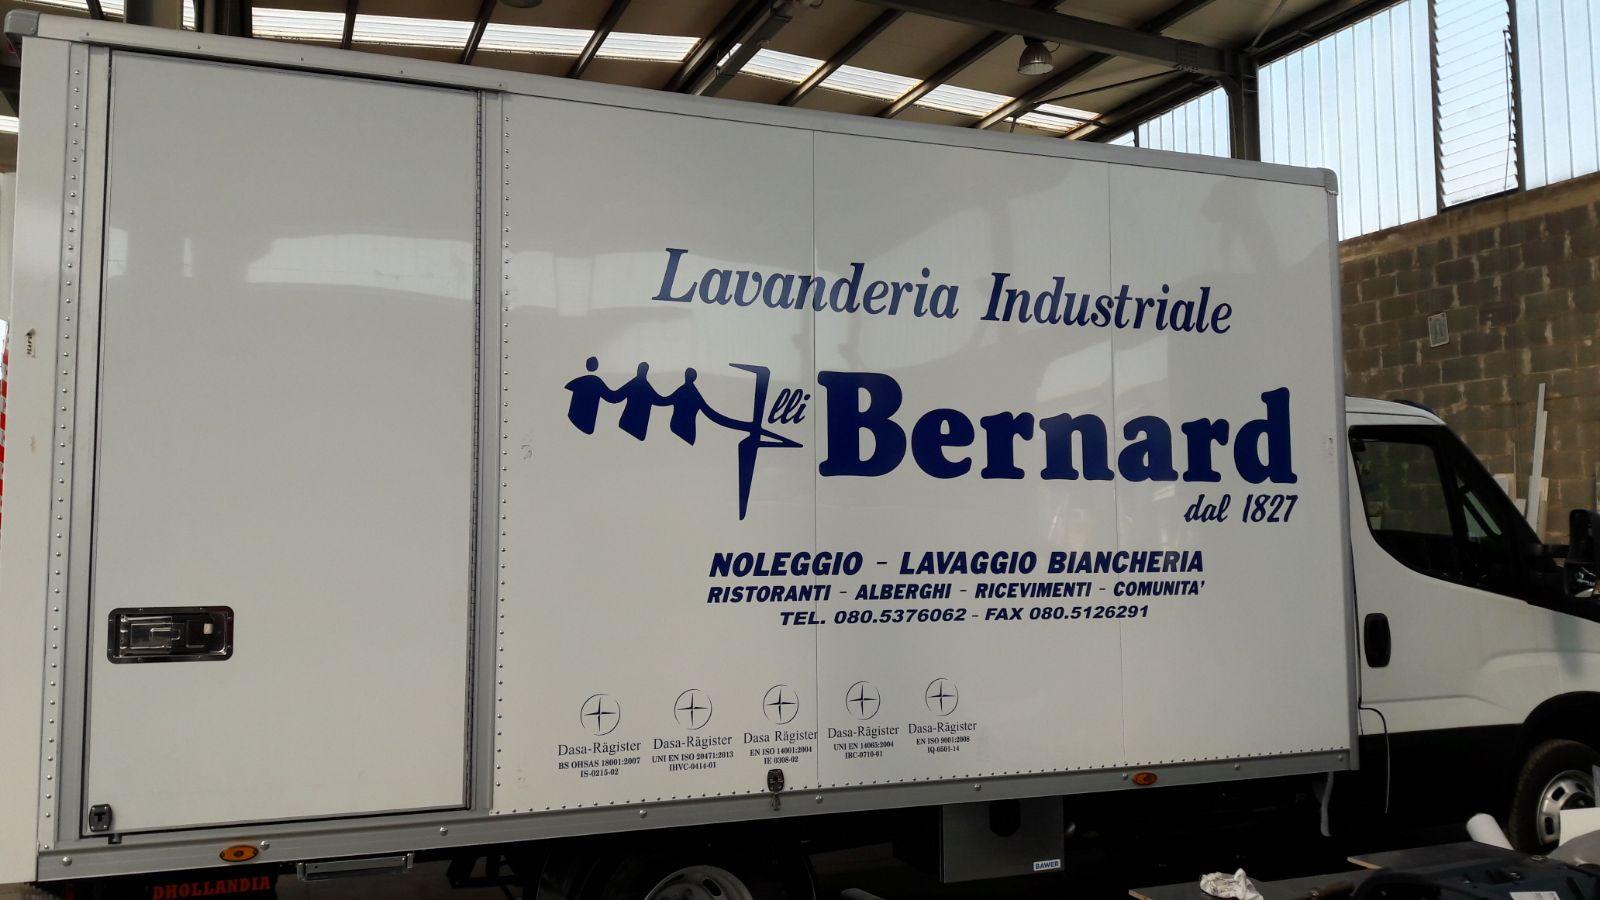 F.LLI BERNARD